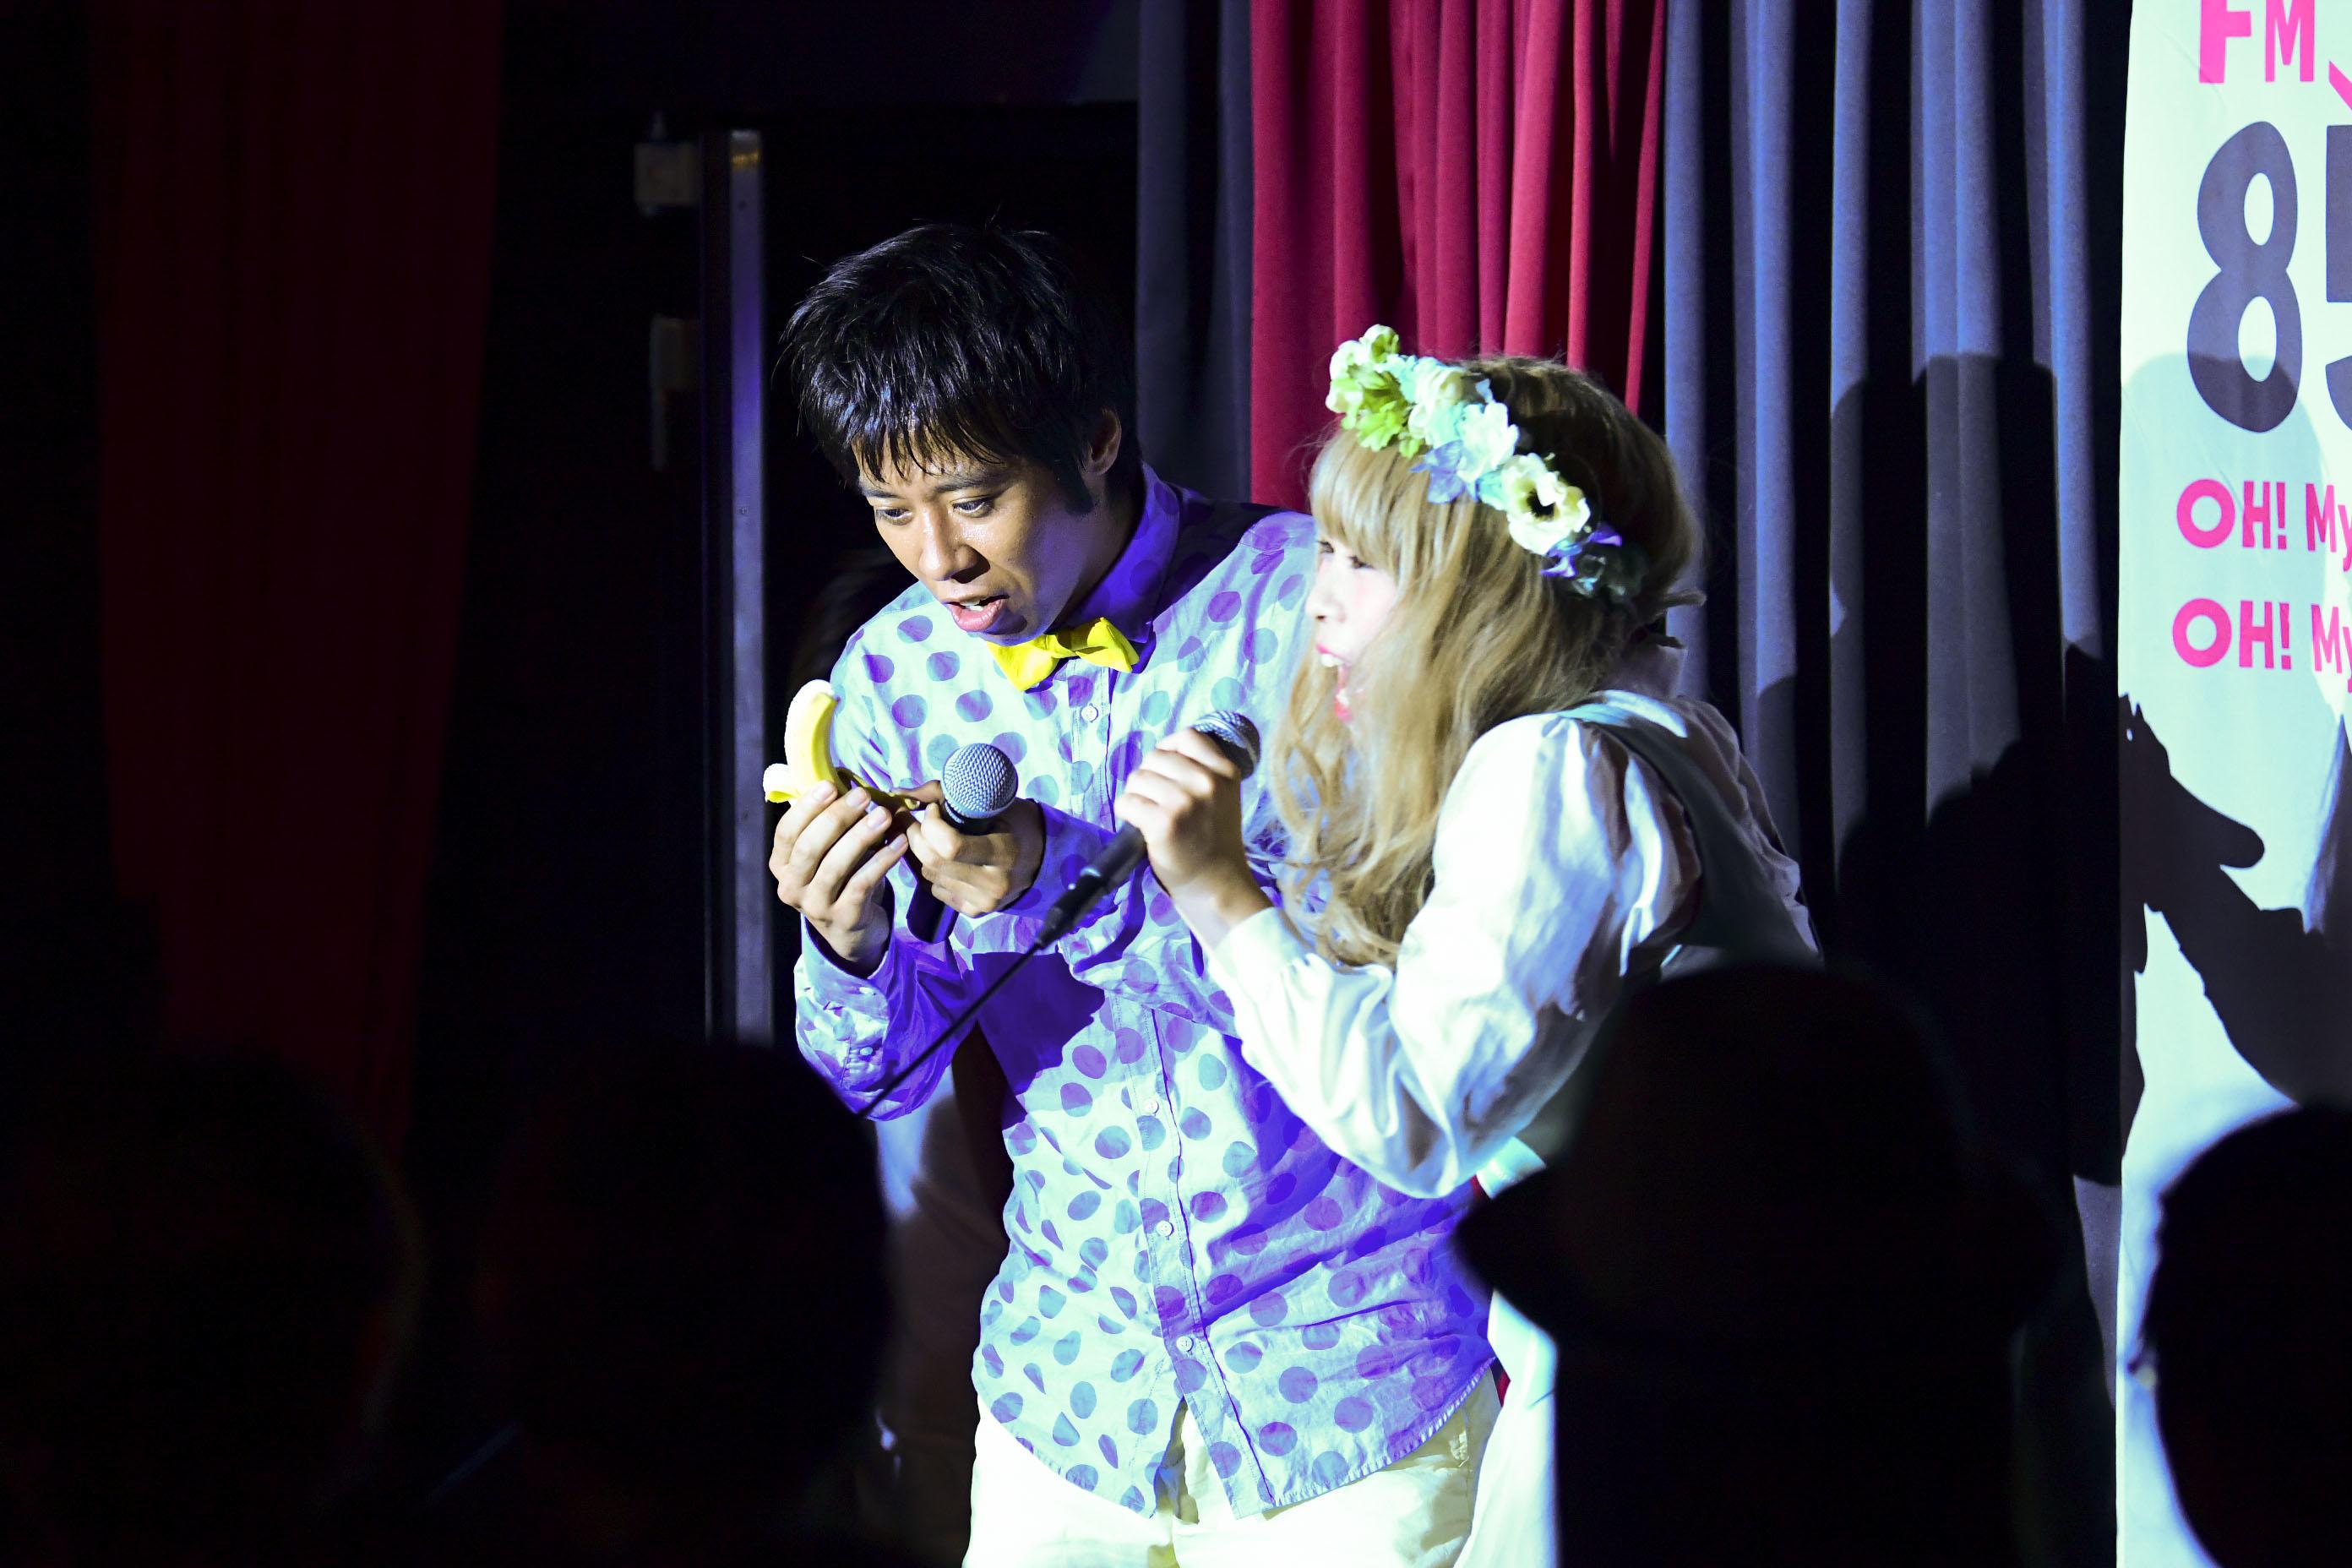 http://news.yoshimoto.co.jp/20170802094719-35a0a4c116e51197f3e239998a9c09d4b8e0488c.jpg